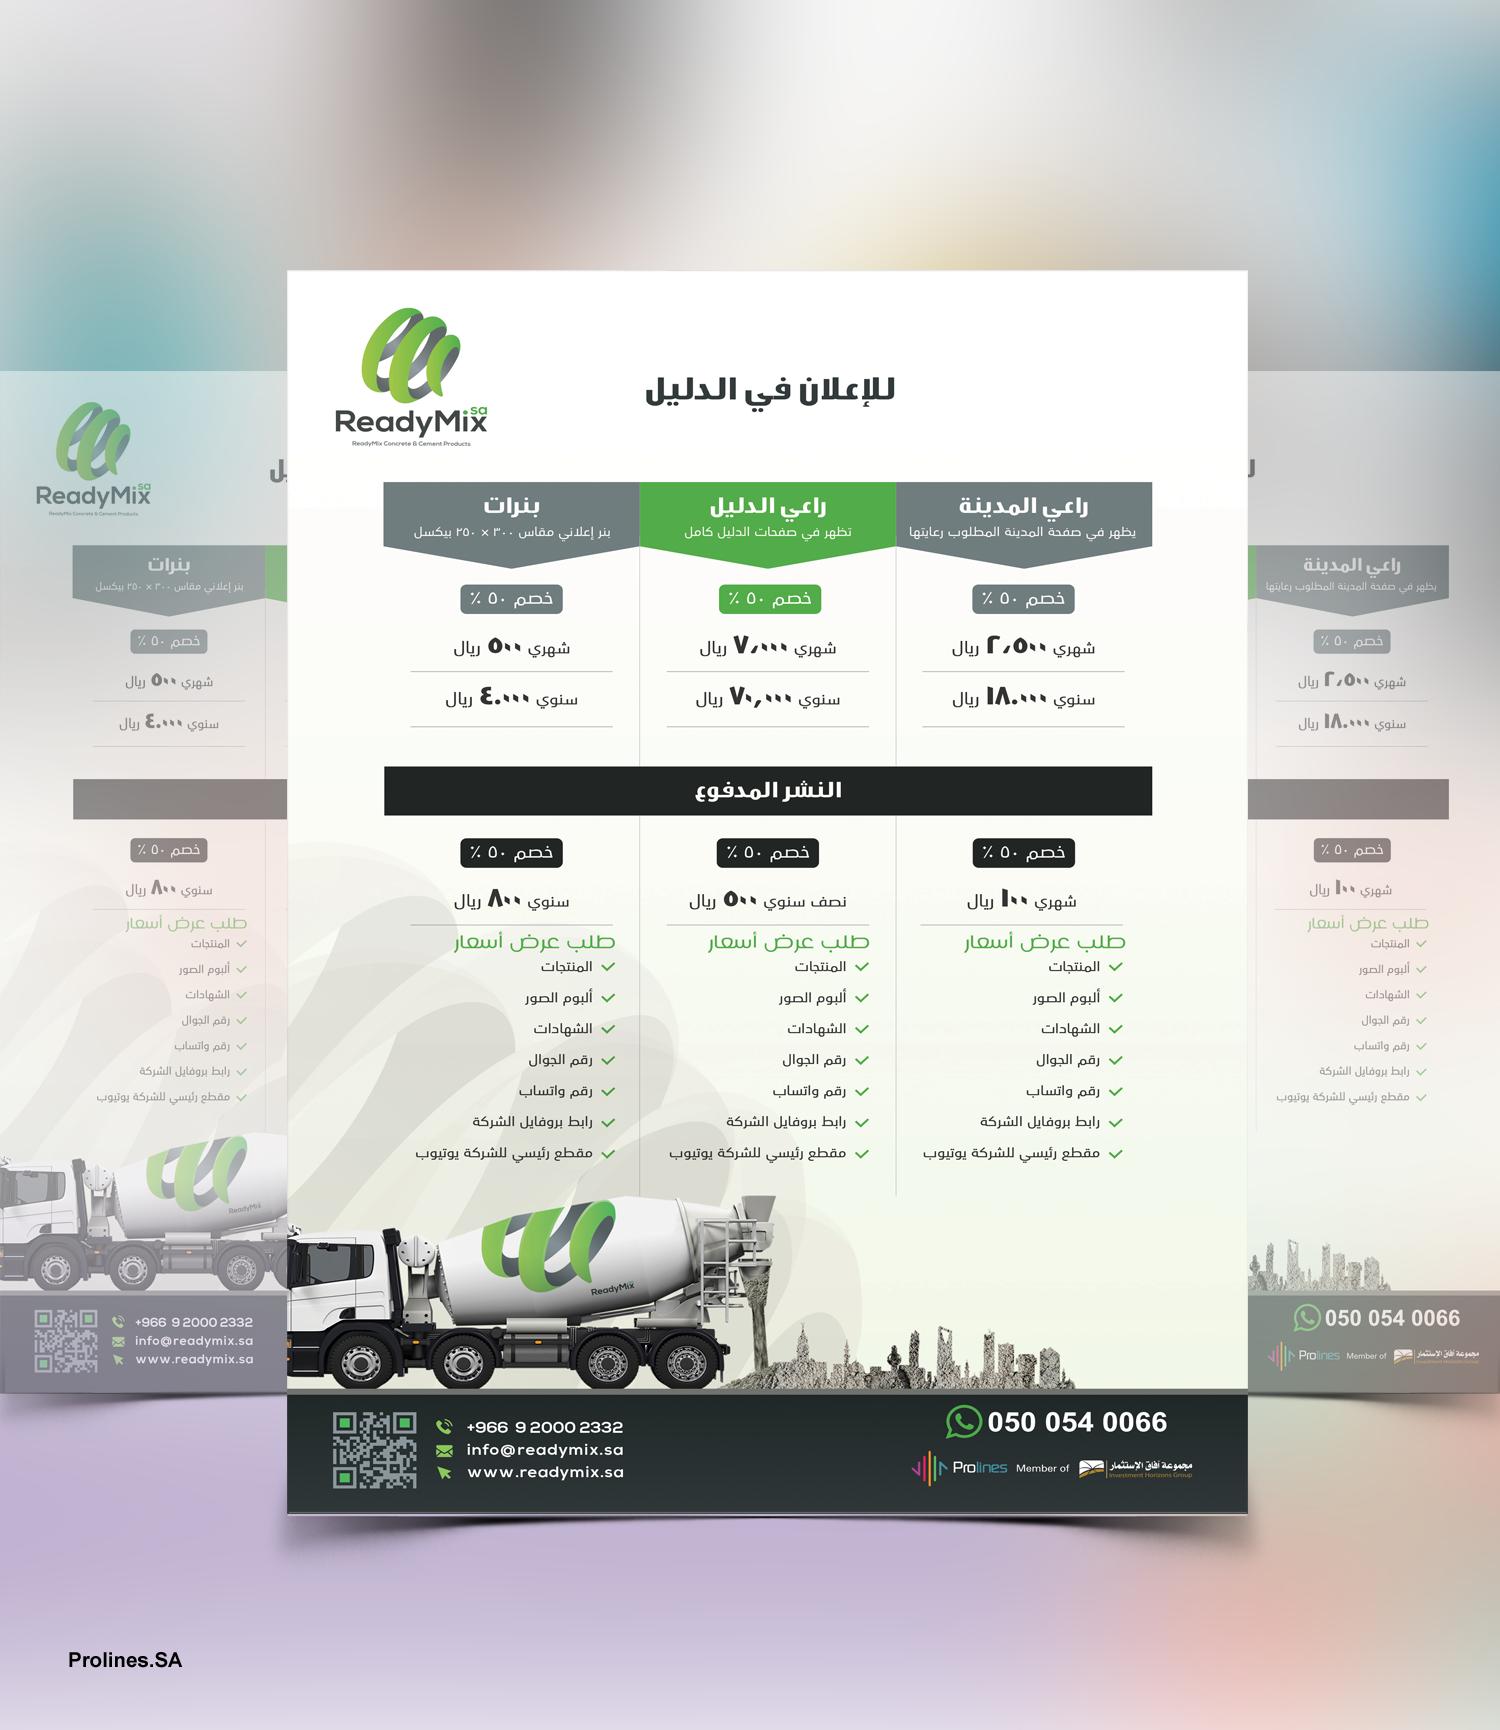 ready-mix-concrete-saudi-arabia-9